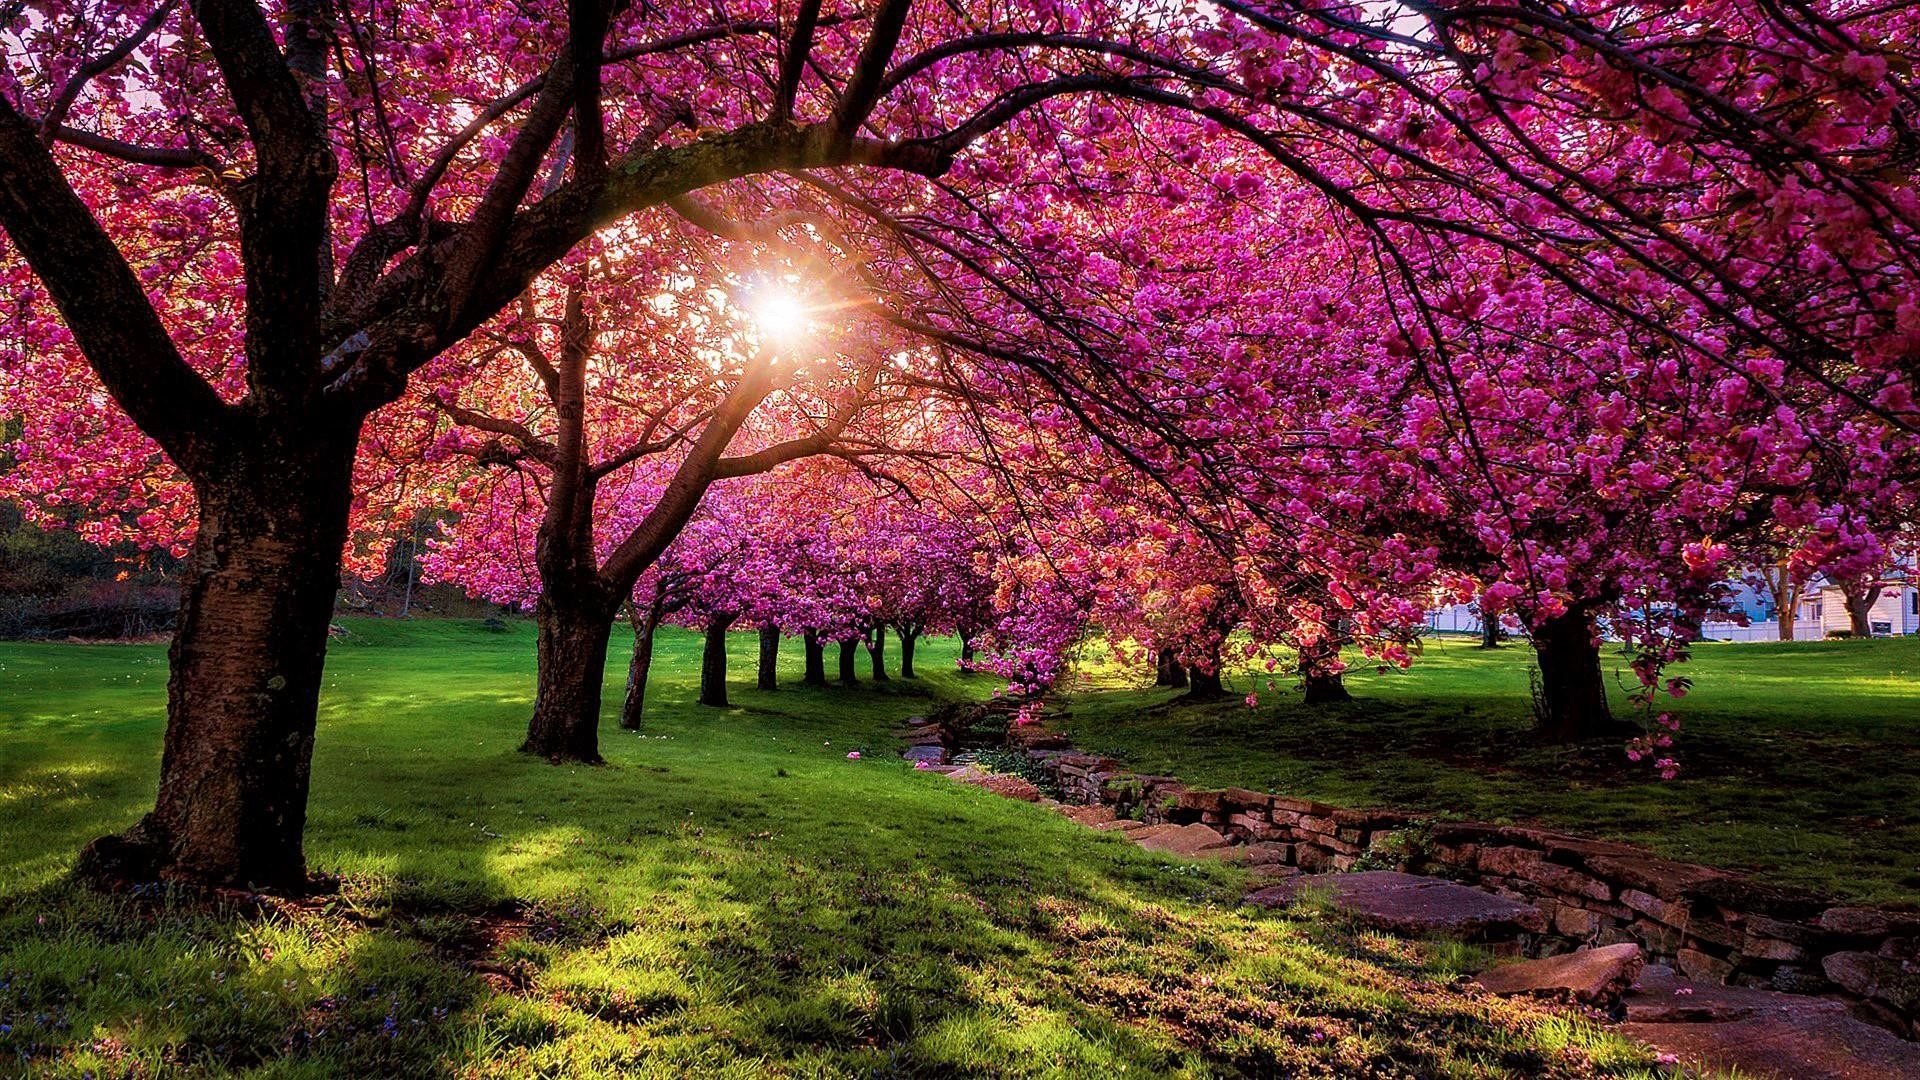 Spring Scenery Wallpaper Hd Wallpaper Bits   Data Src - Spring Scenery Wallpaper Desktop - HD Wallpaper